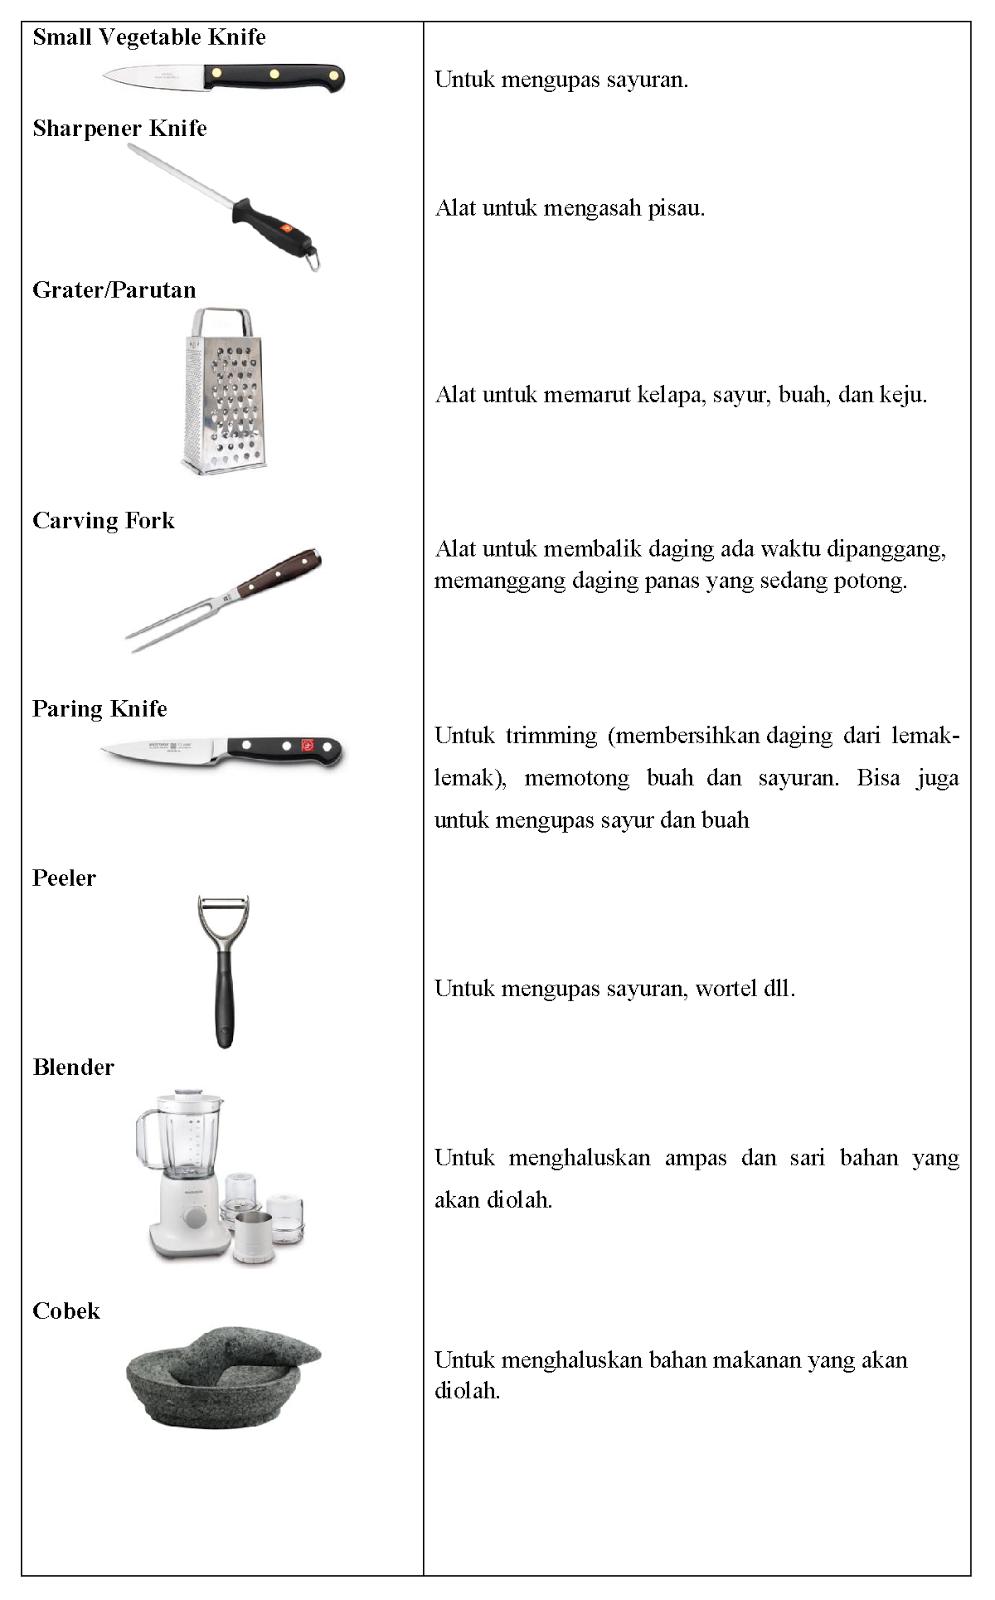 Jenis Peralatan Fungsi Pengolahan Makanan